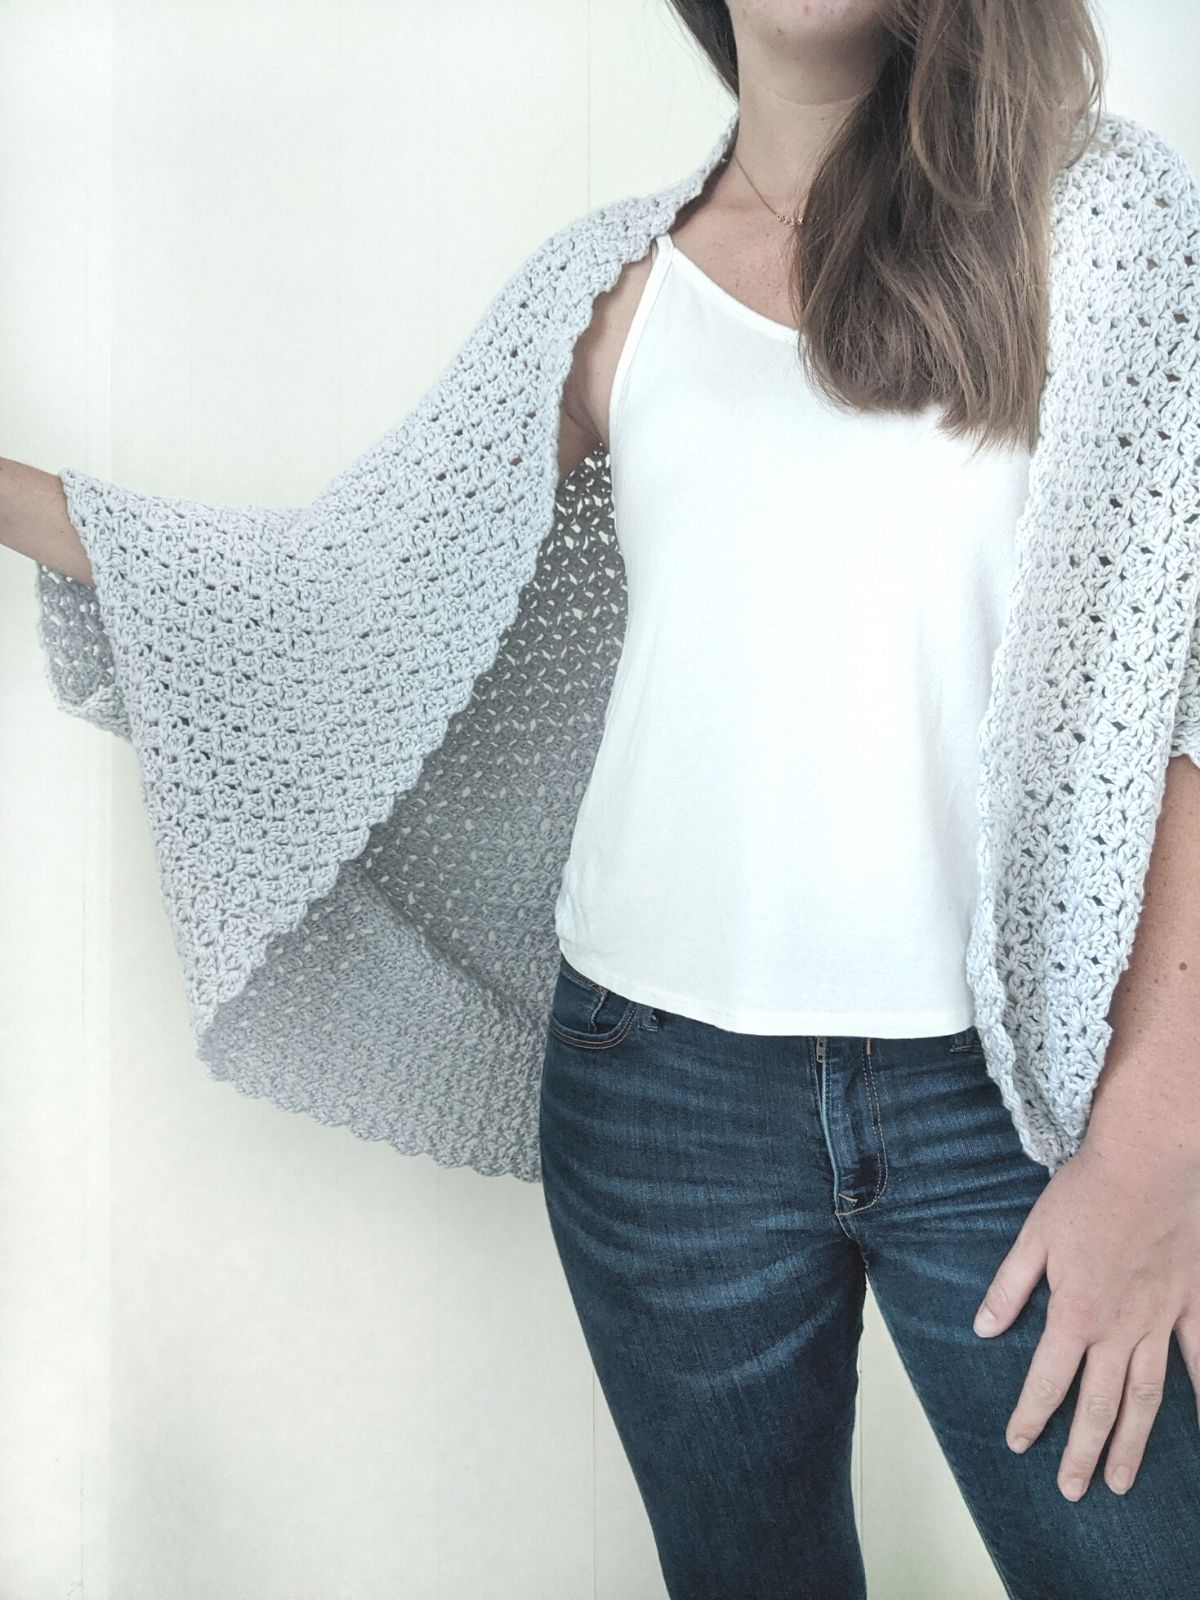 long flowy crochet shrug made with cotton yarn